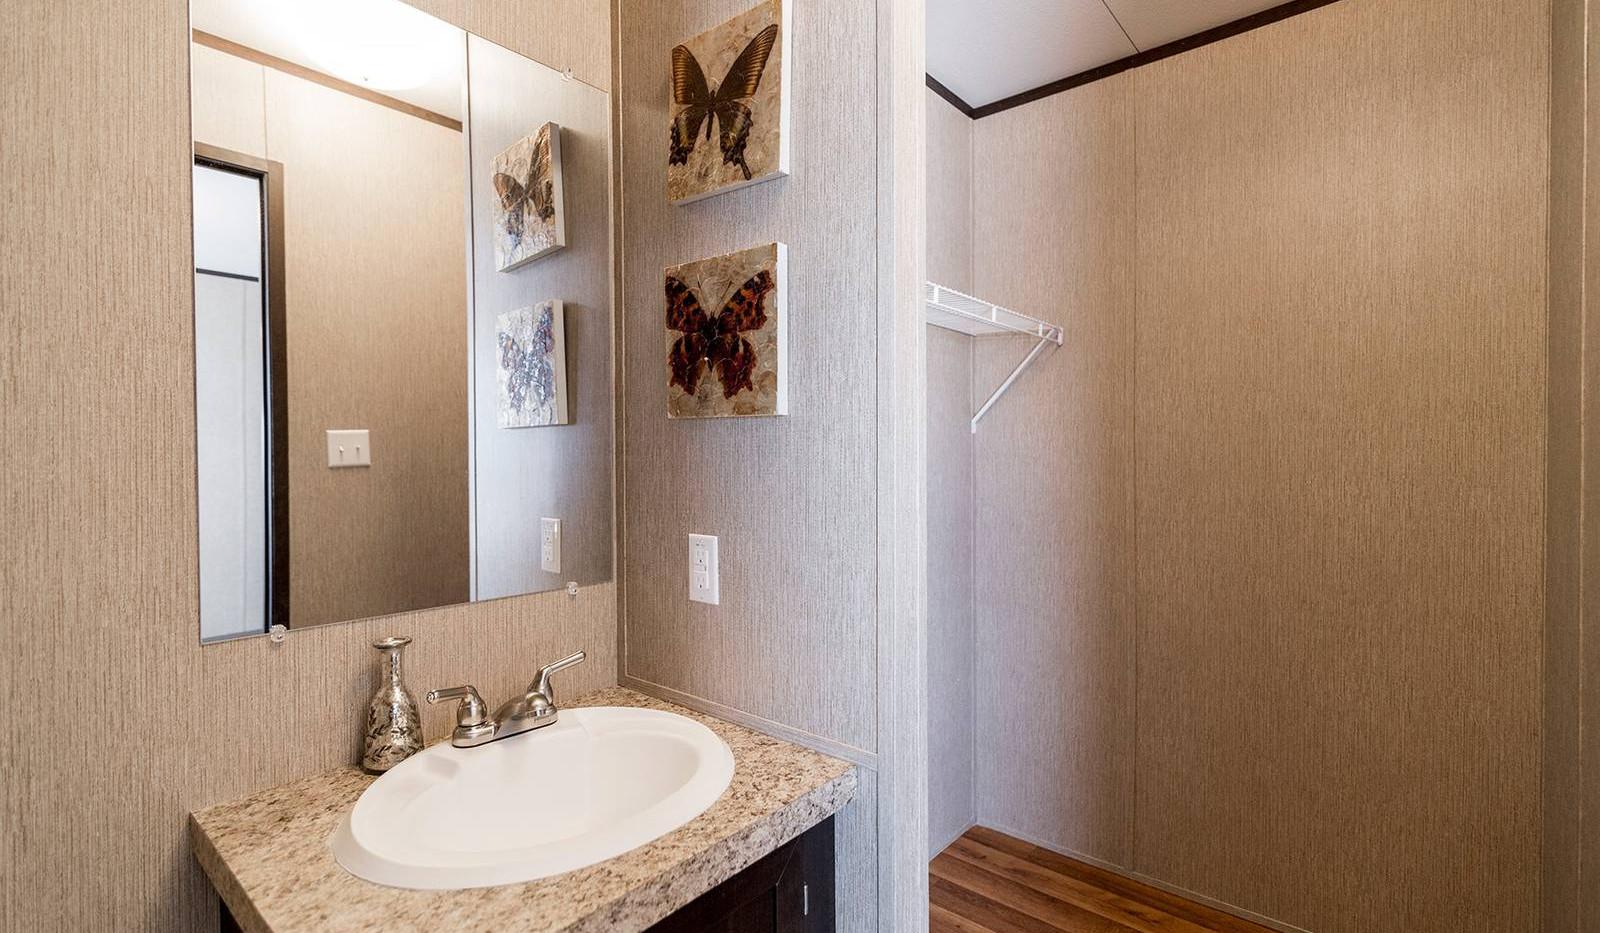 6-redman-1466a-master-bathroom-1b-1600x1